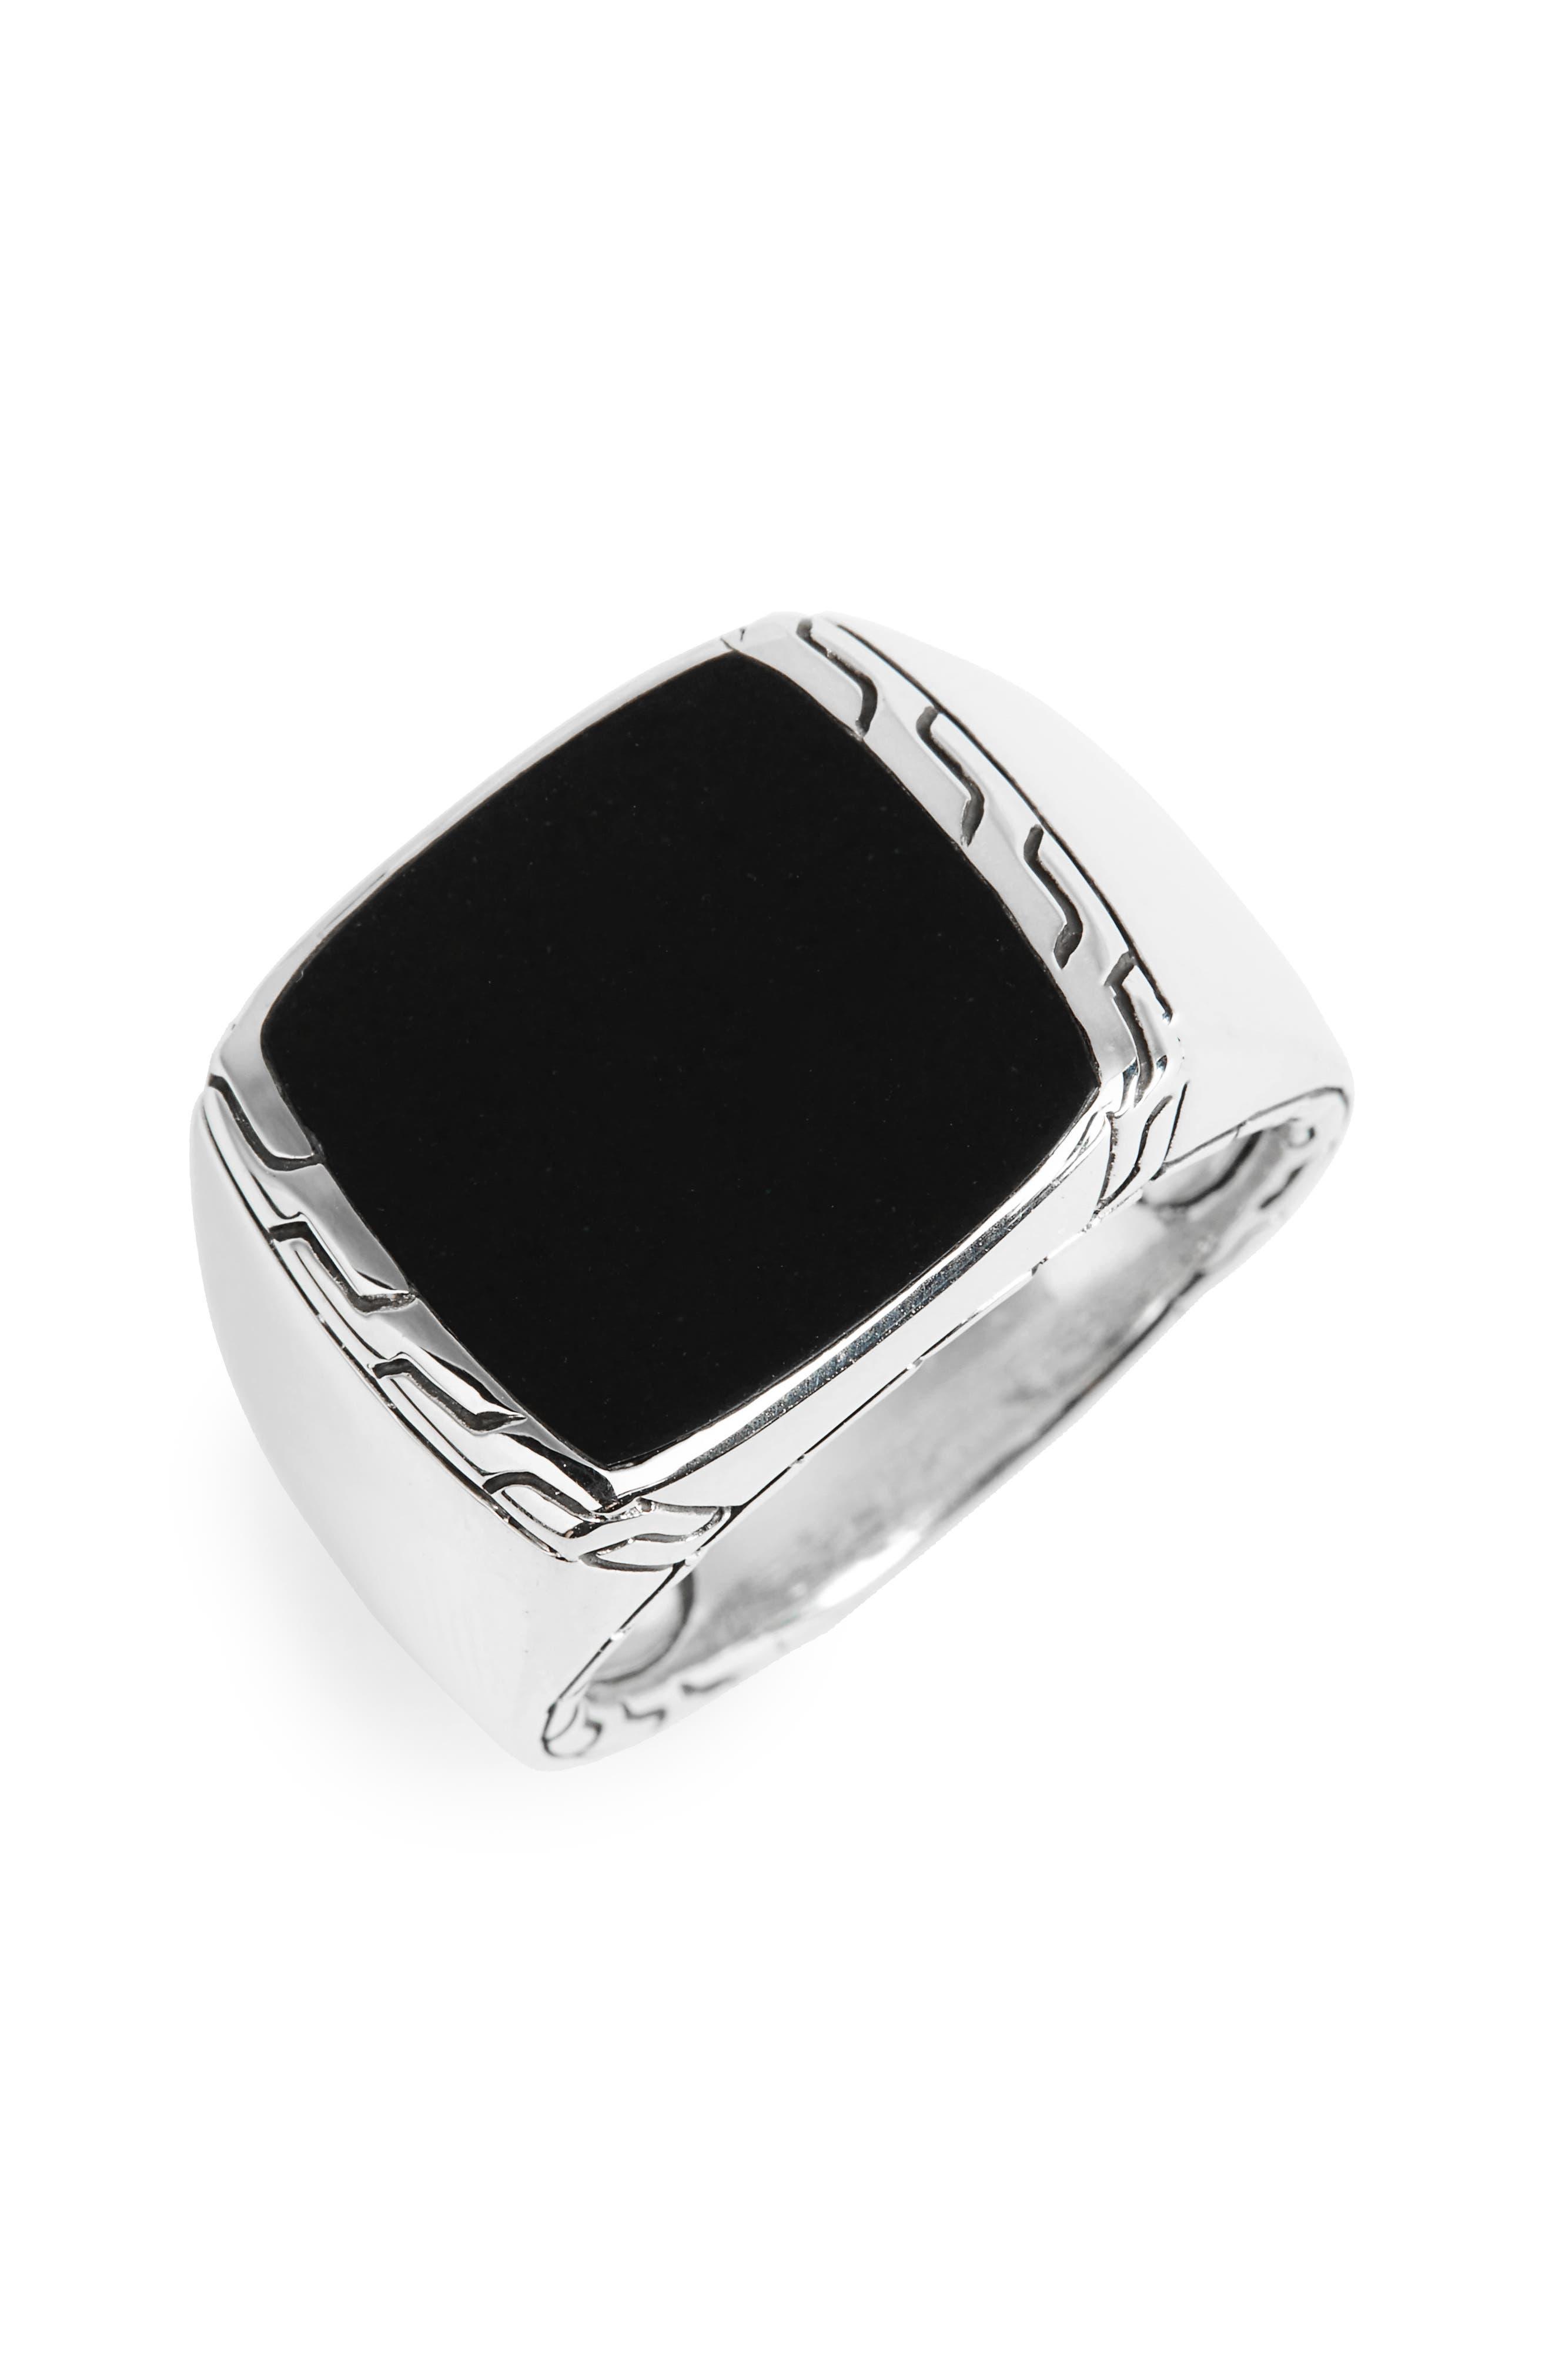 Main Image - John Hardy Classic Chain Signet Ring